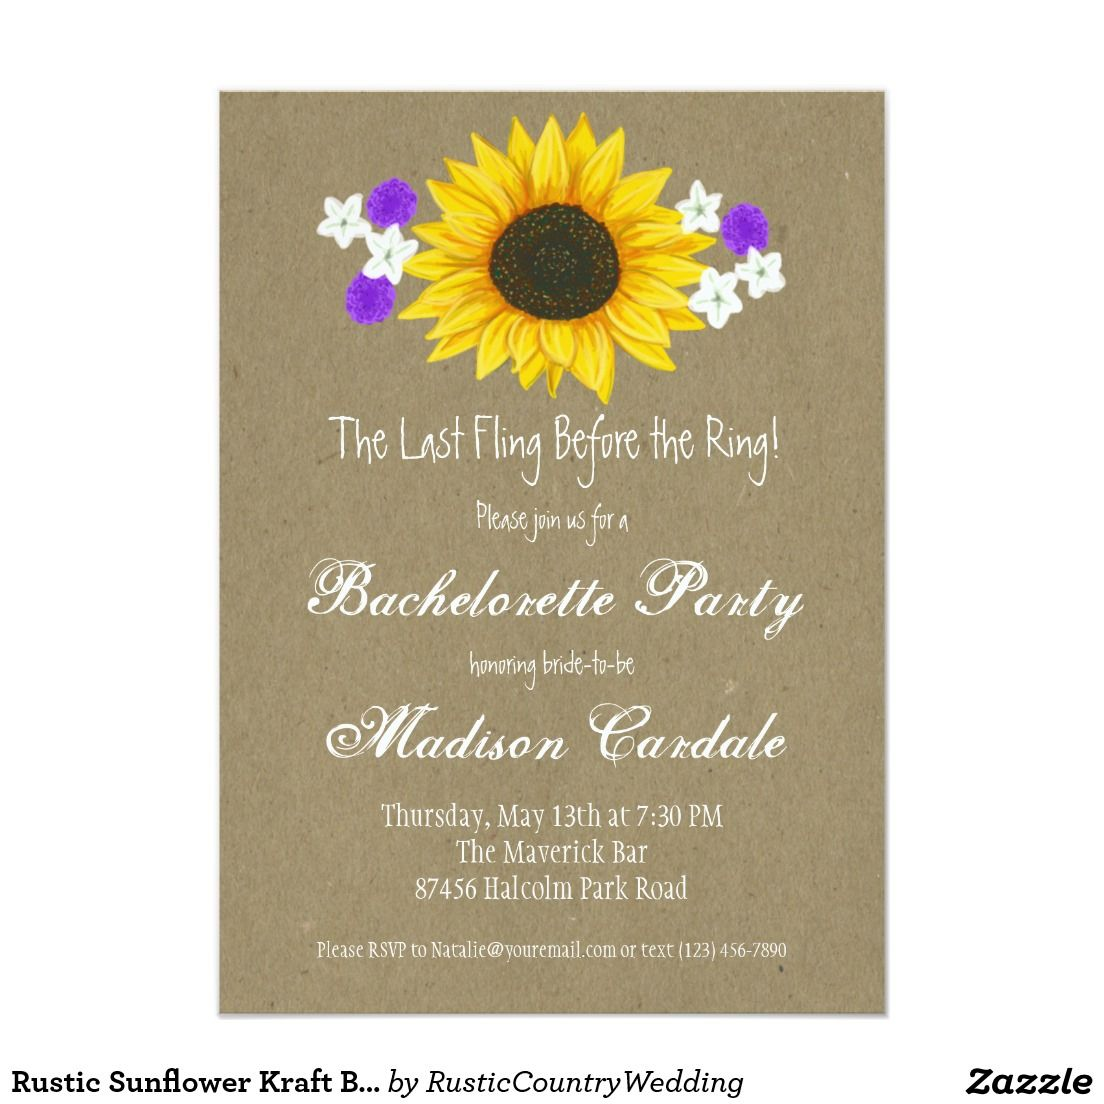 Rustic Sunflower Kraft Bachelorette Party Invites | Bachelorette ...